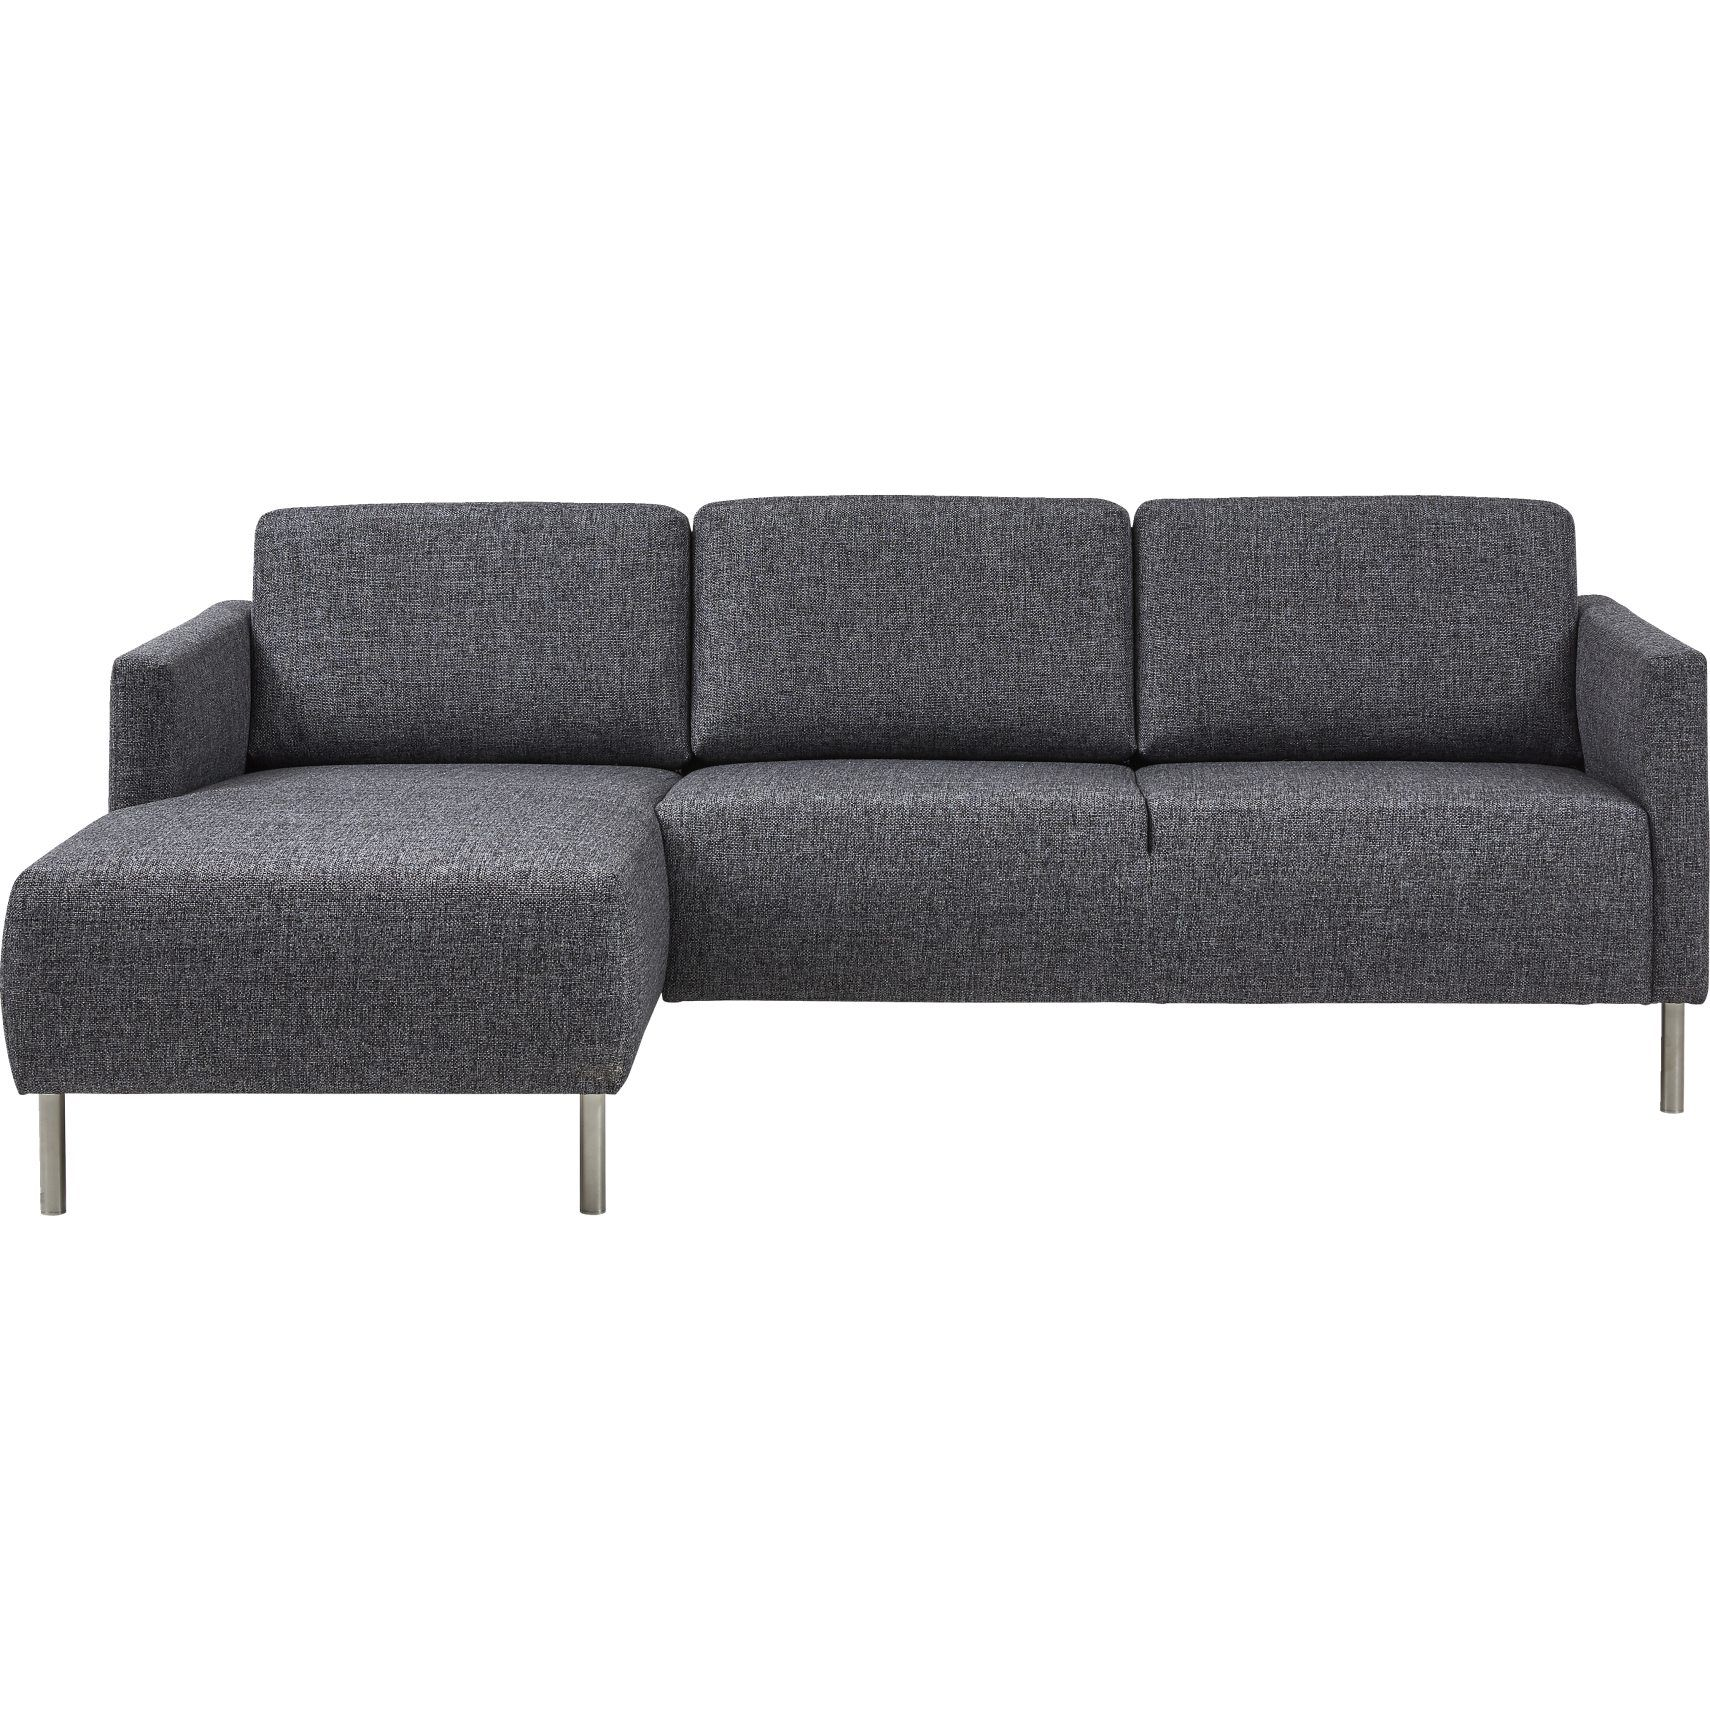 Pæn Flavio, Idémøbler. NU 4000 kr (førpris 6000 kr) | Klostergade 68 ZD51